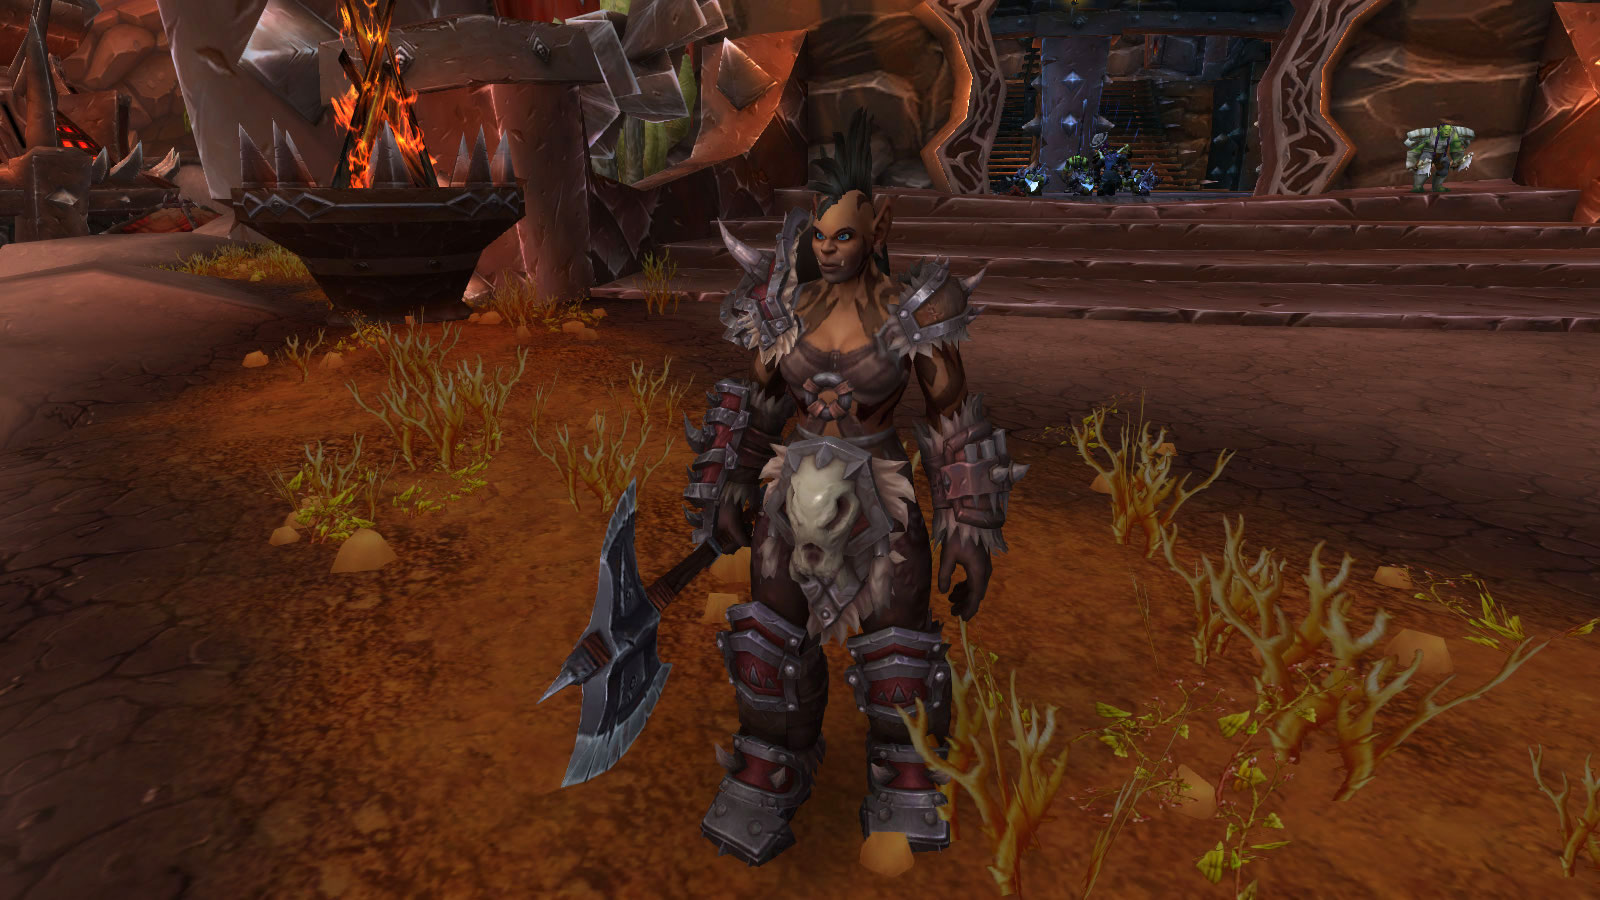 Commandant Geya'rah à l'avant-poste des Orcs Mag'har